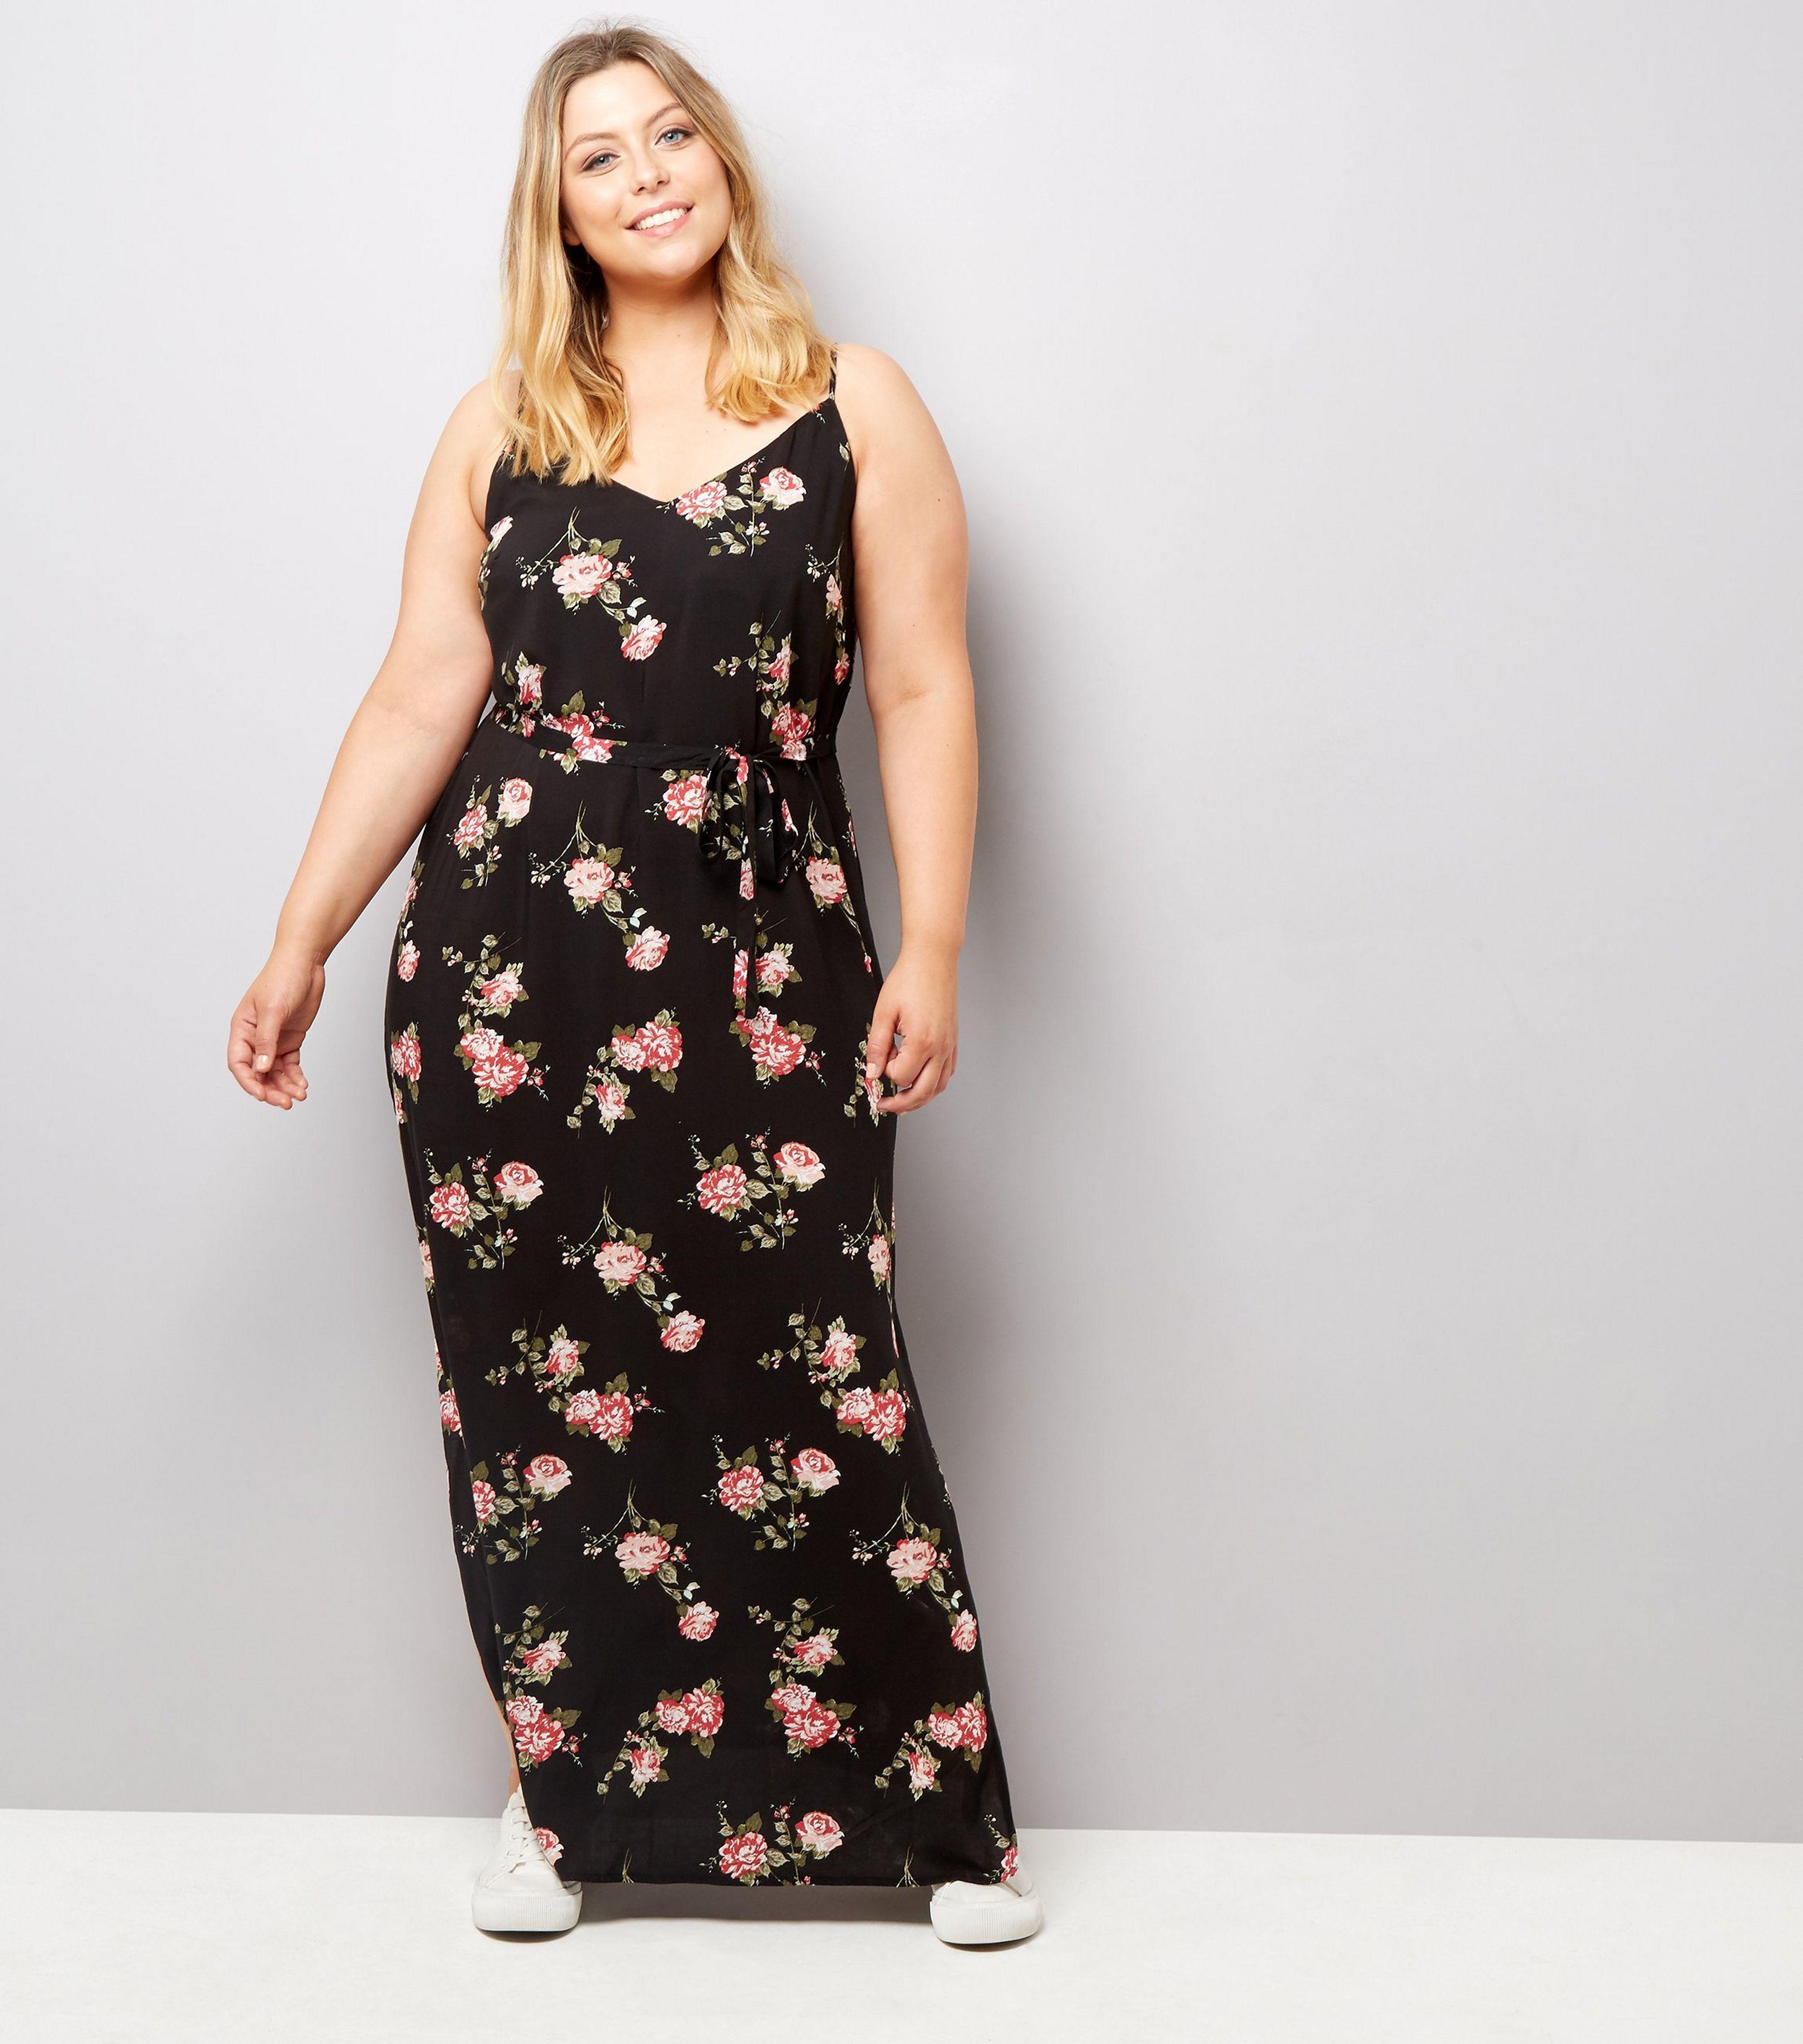 e7dd05389d New Look Curves Black Rose Floral Print Maxi Dress in Black - Lyst